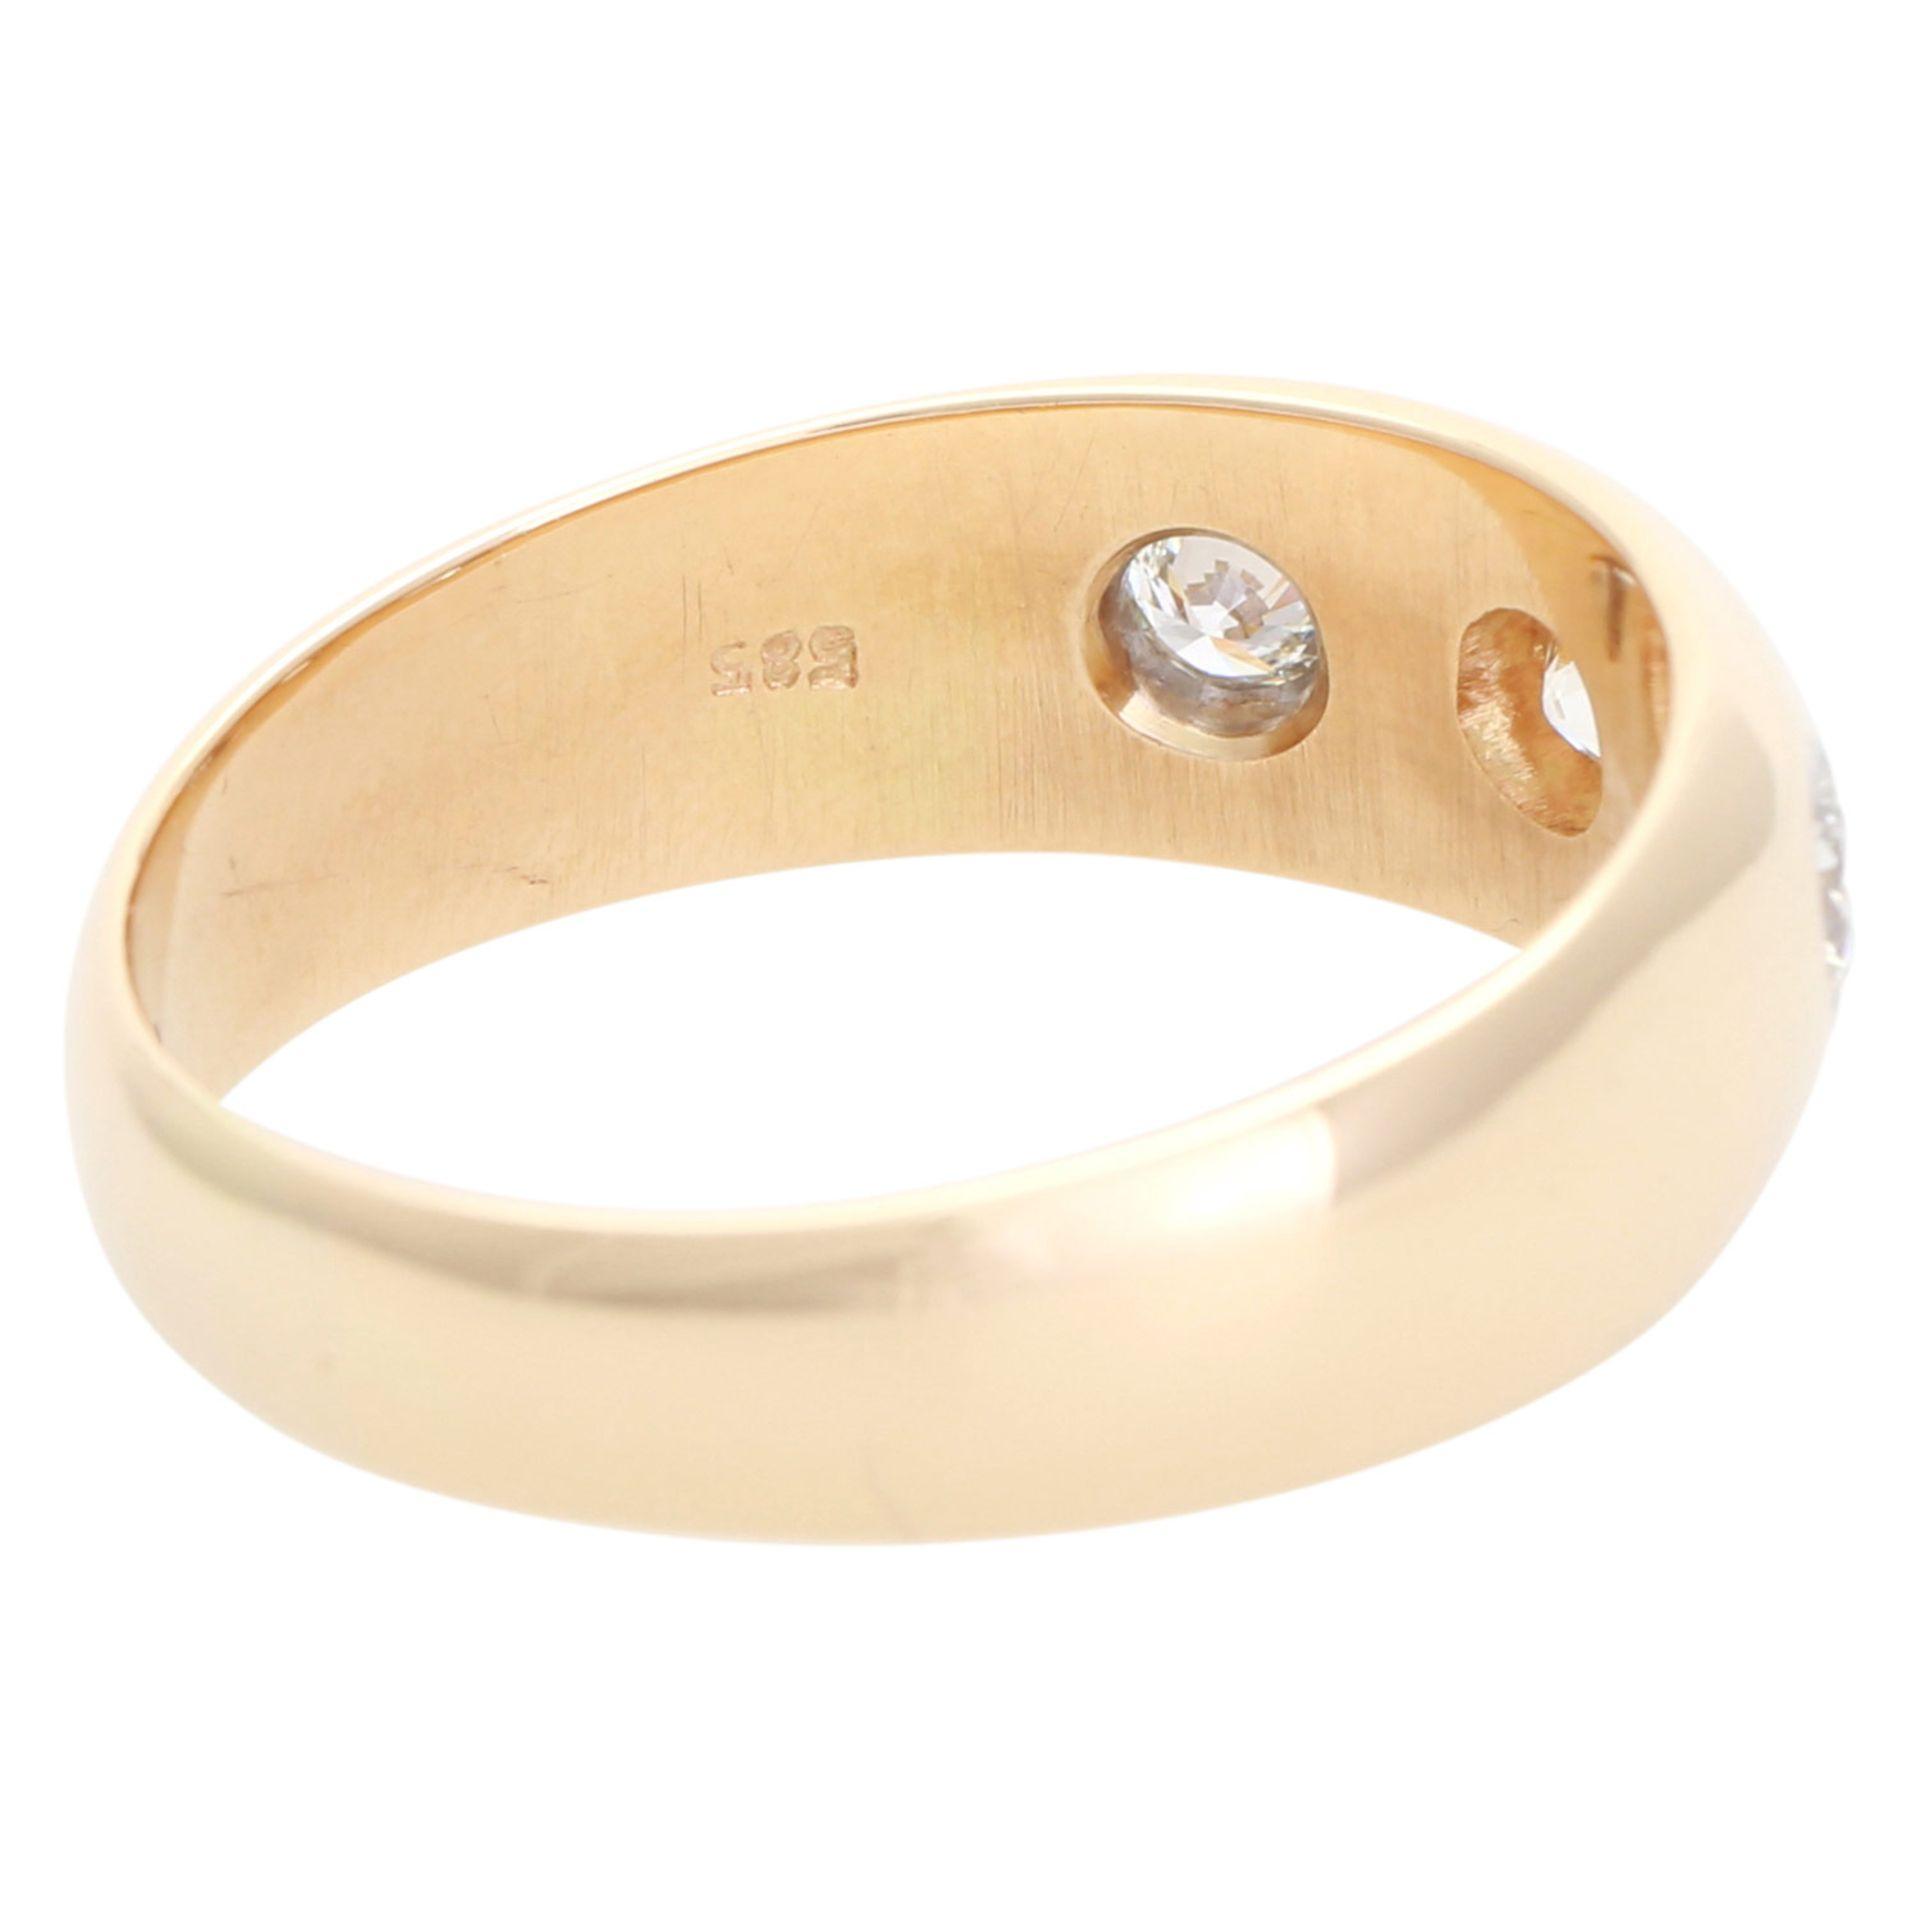 Los 26 - Ring mit 2 Brillanten,1 Altschliff Dia. GG 14K, Dia. zus. ca. 0,5 ct, LGW - GW (I - K) - VS, RW ca.